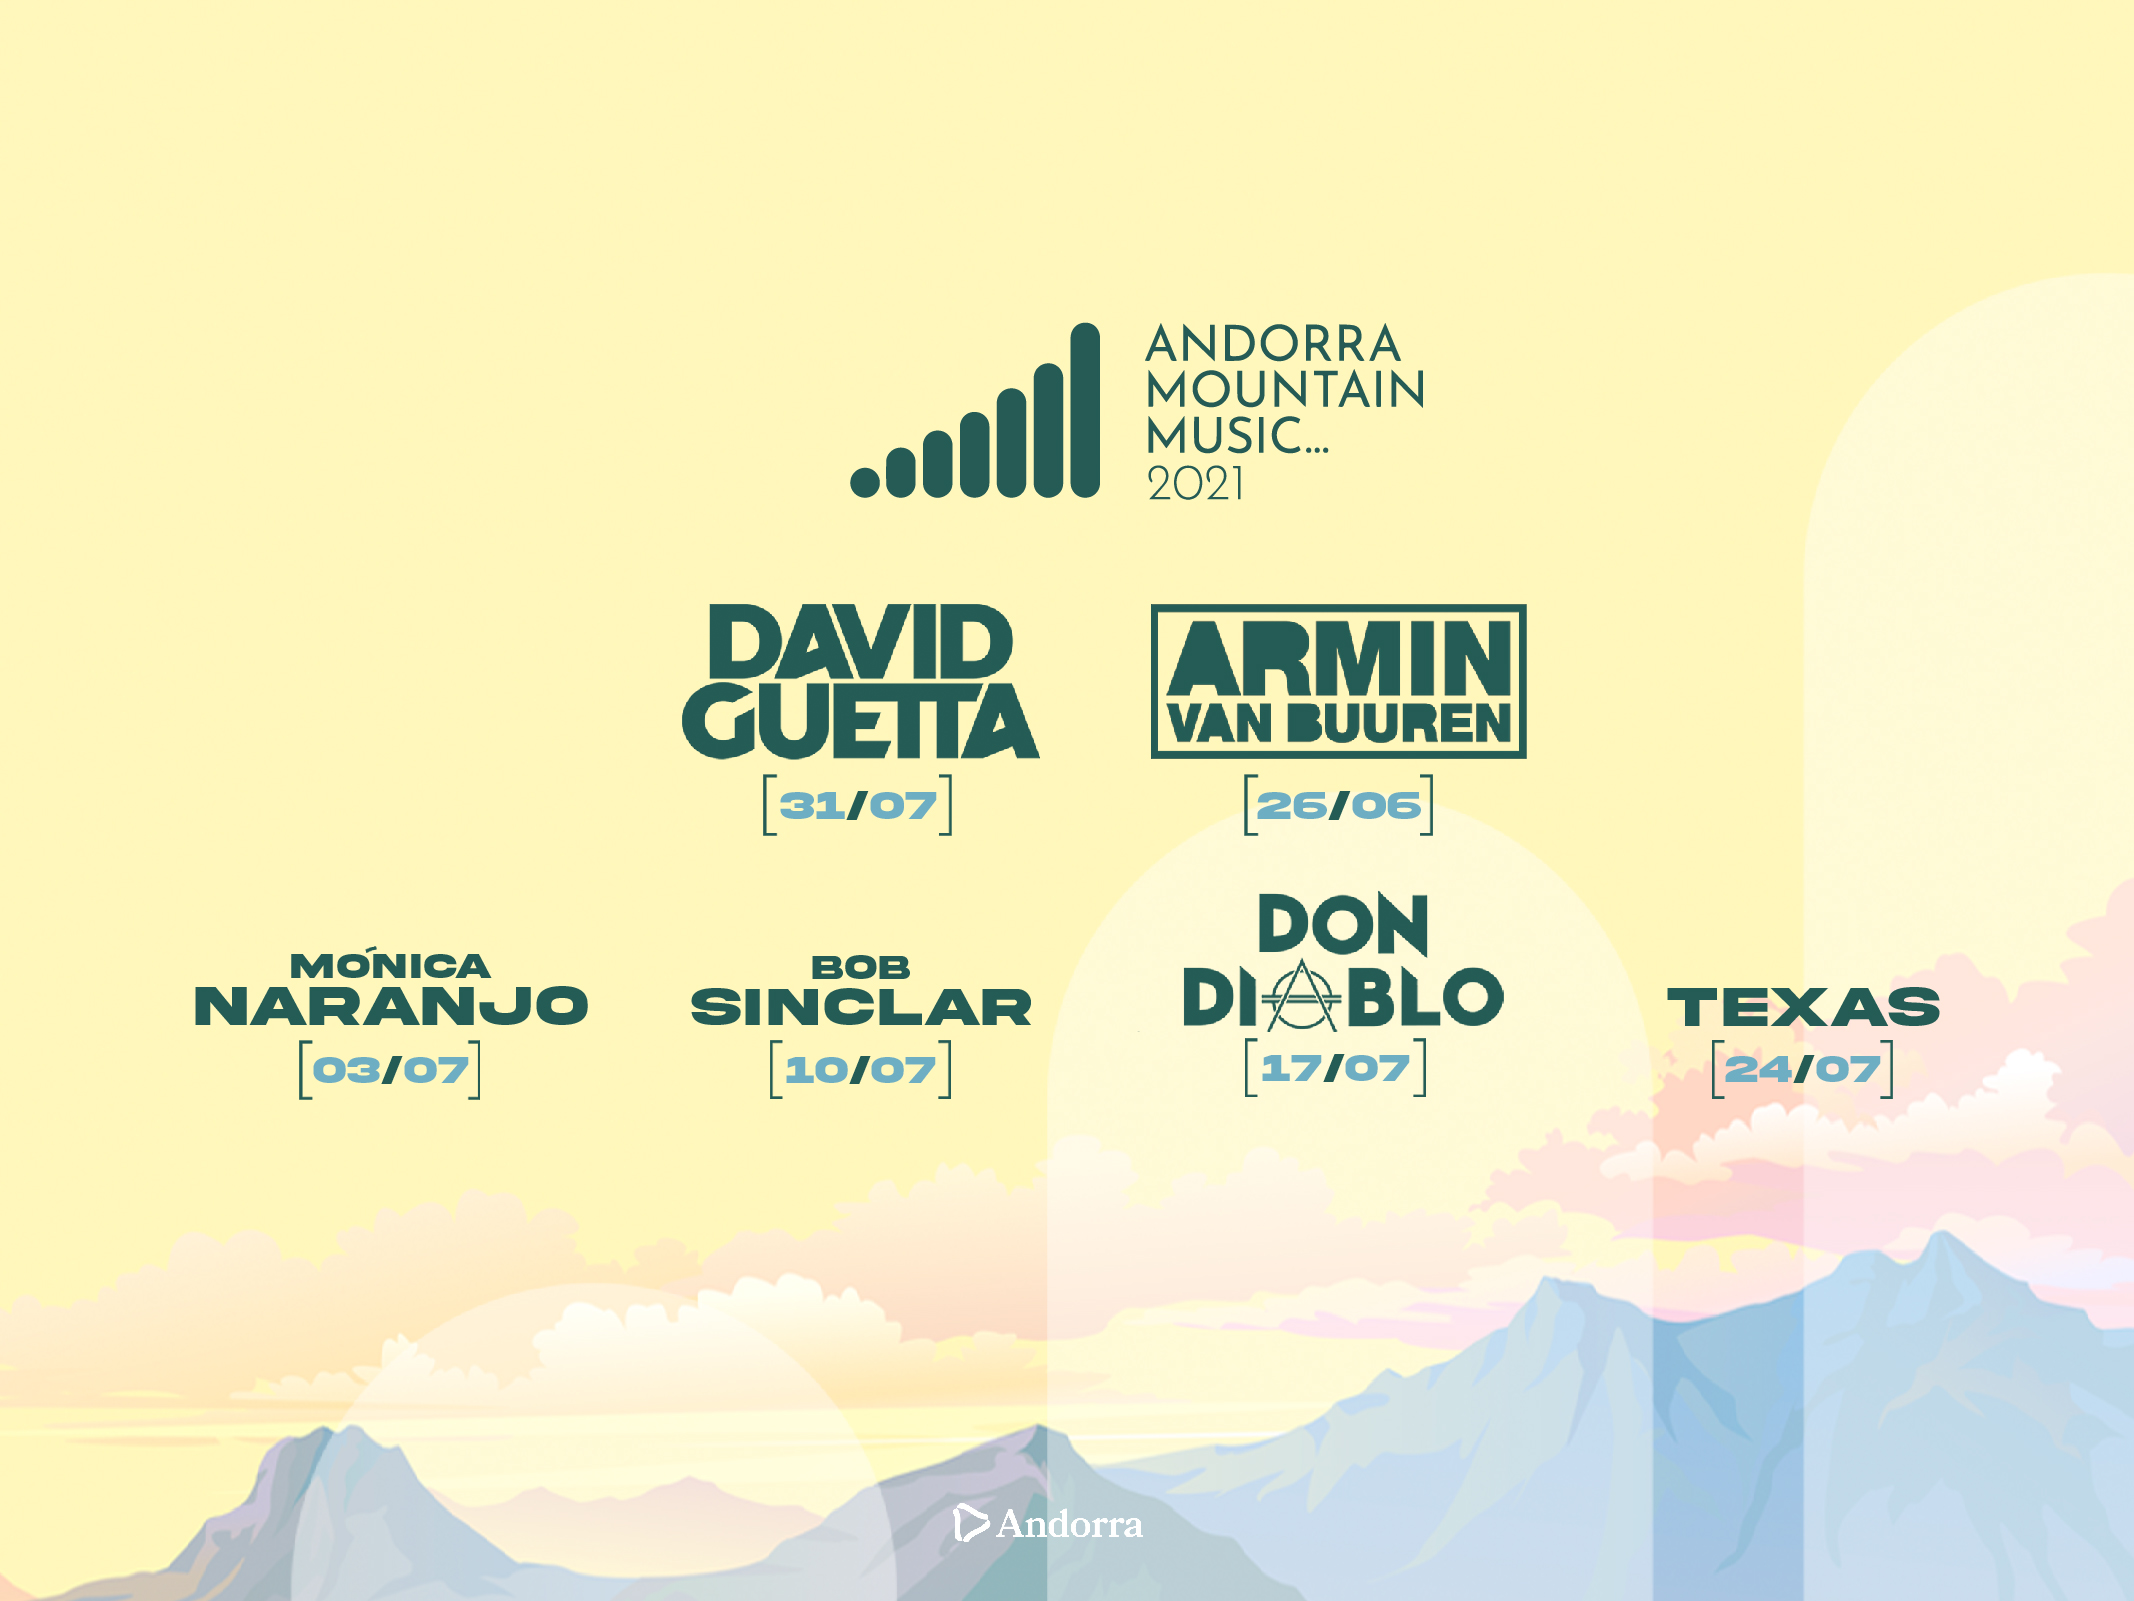 Andorra Music Festival